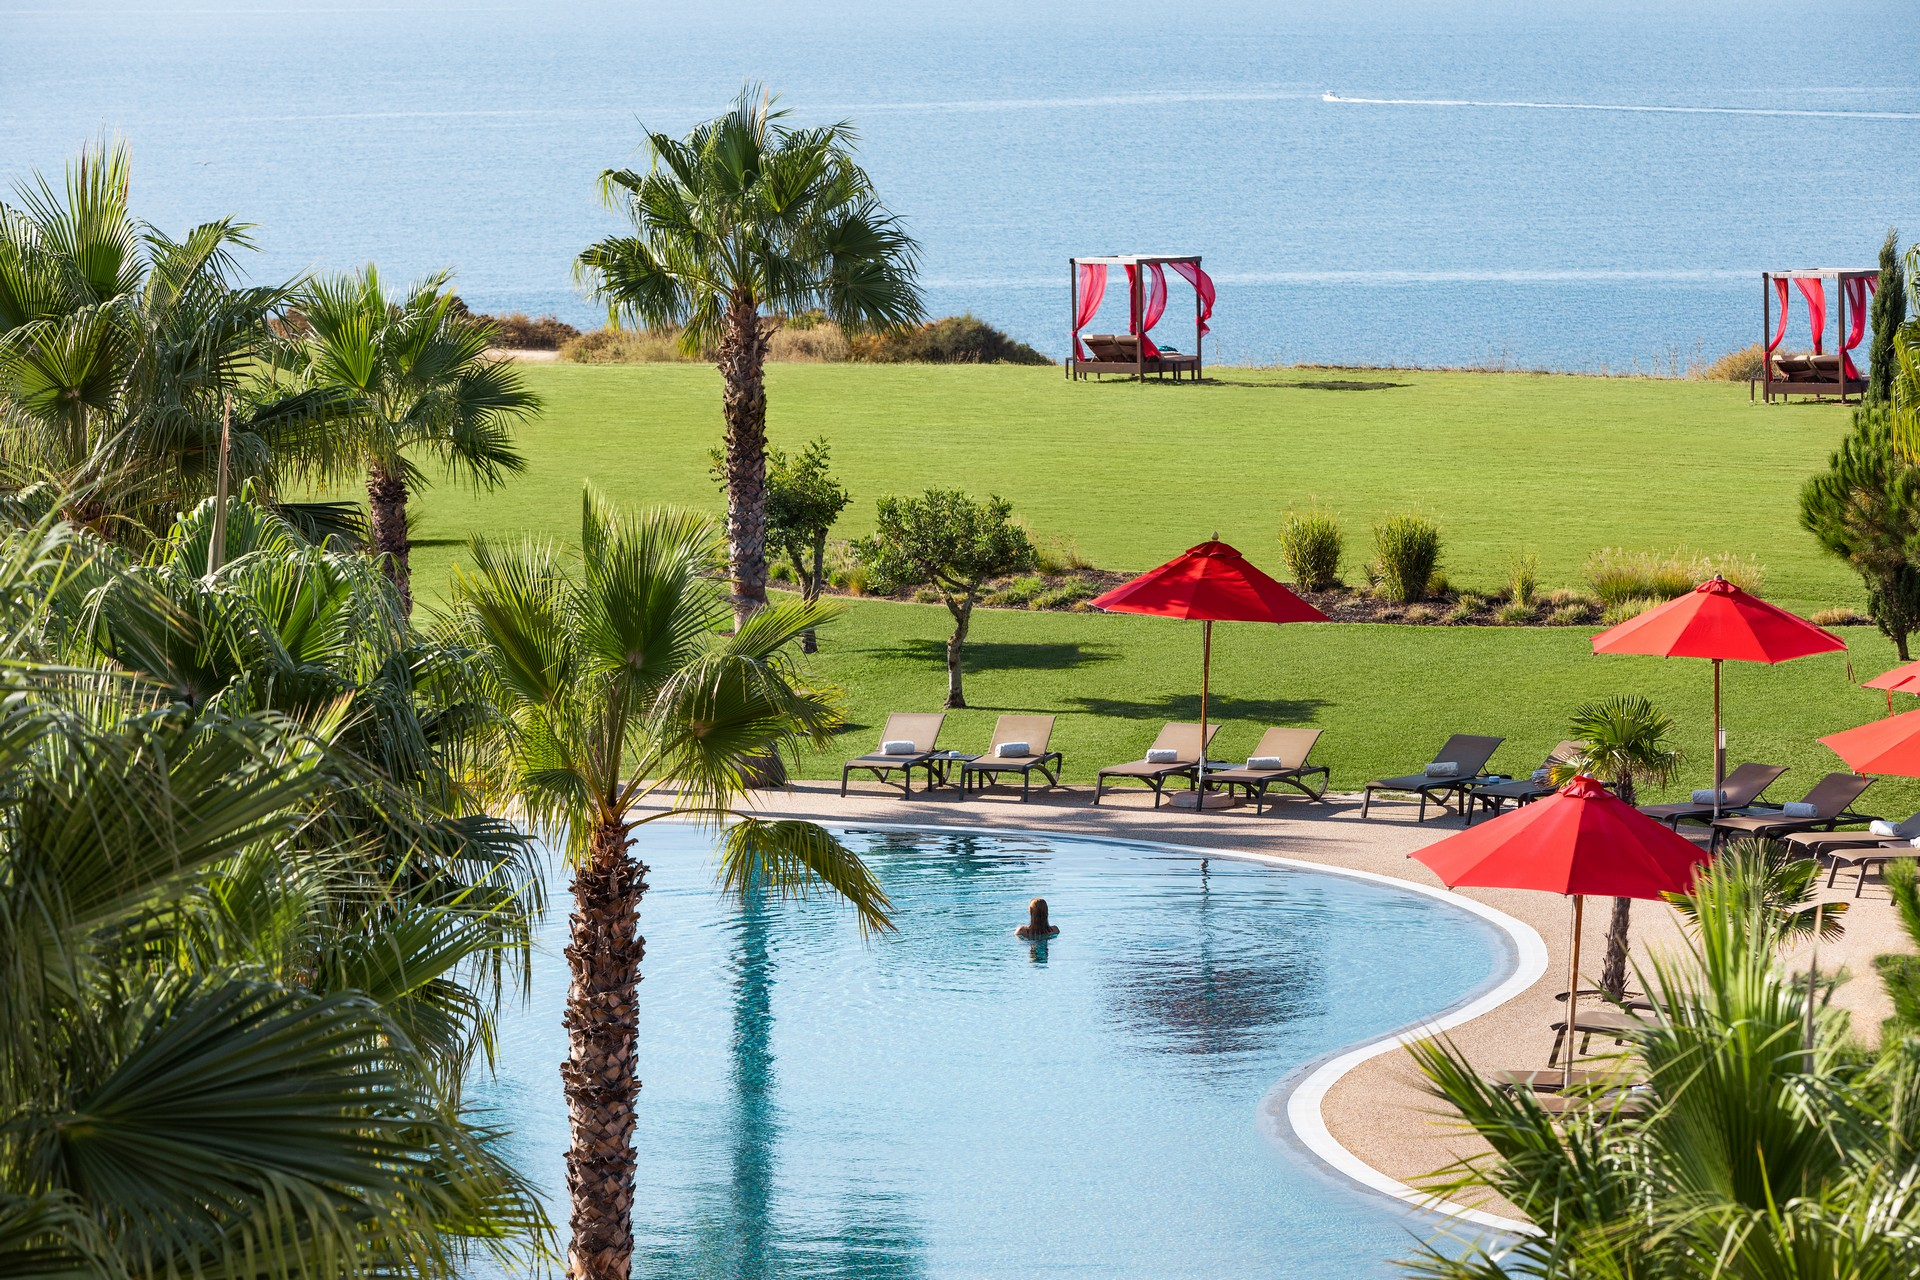 Best Portuguese Spas best portuguese spas Best Portuguese Spas: Cascade Wellness & Lifestyle Resort Best Portuguese Spas 2 1